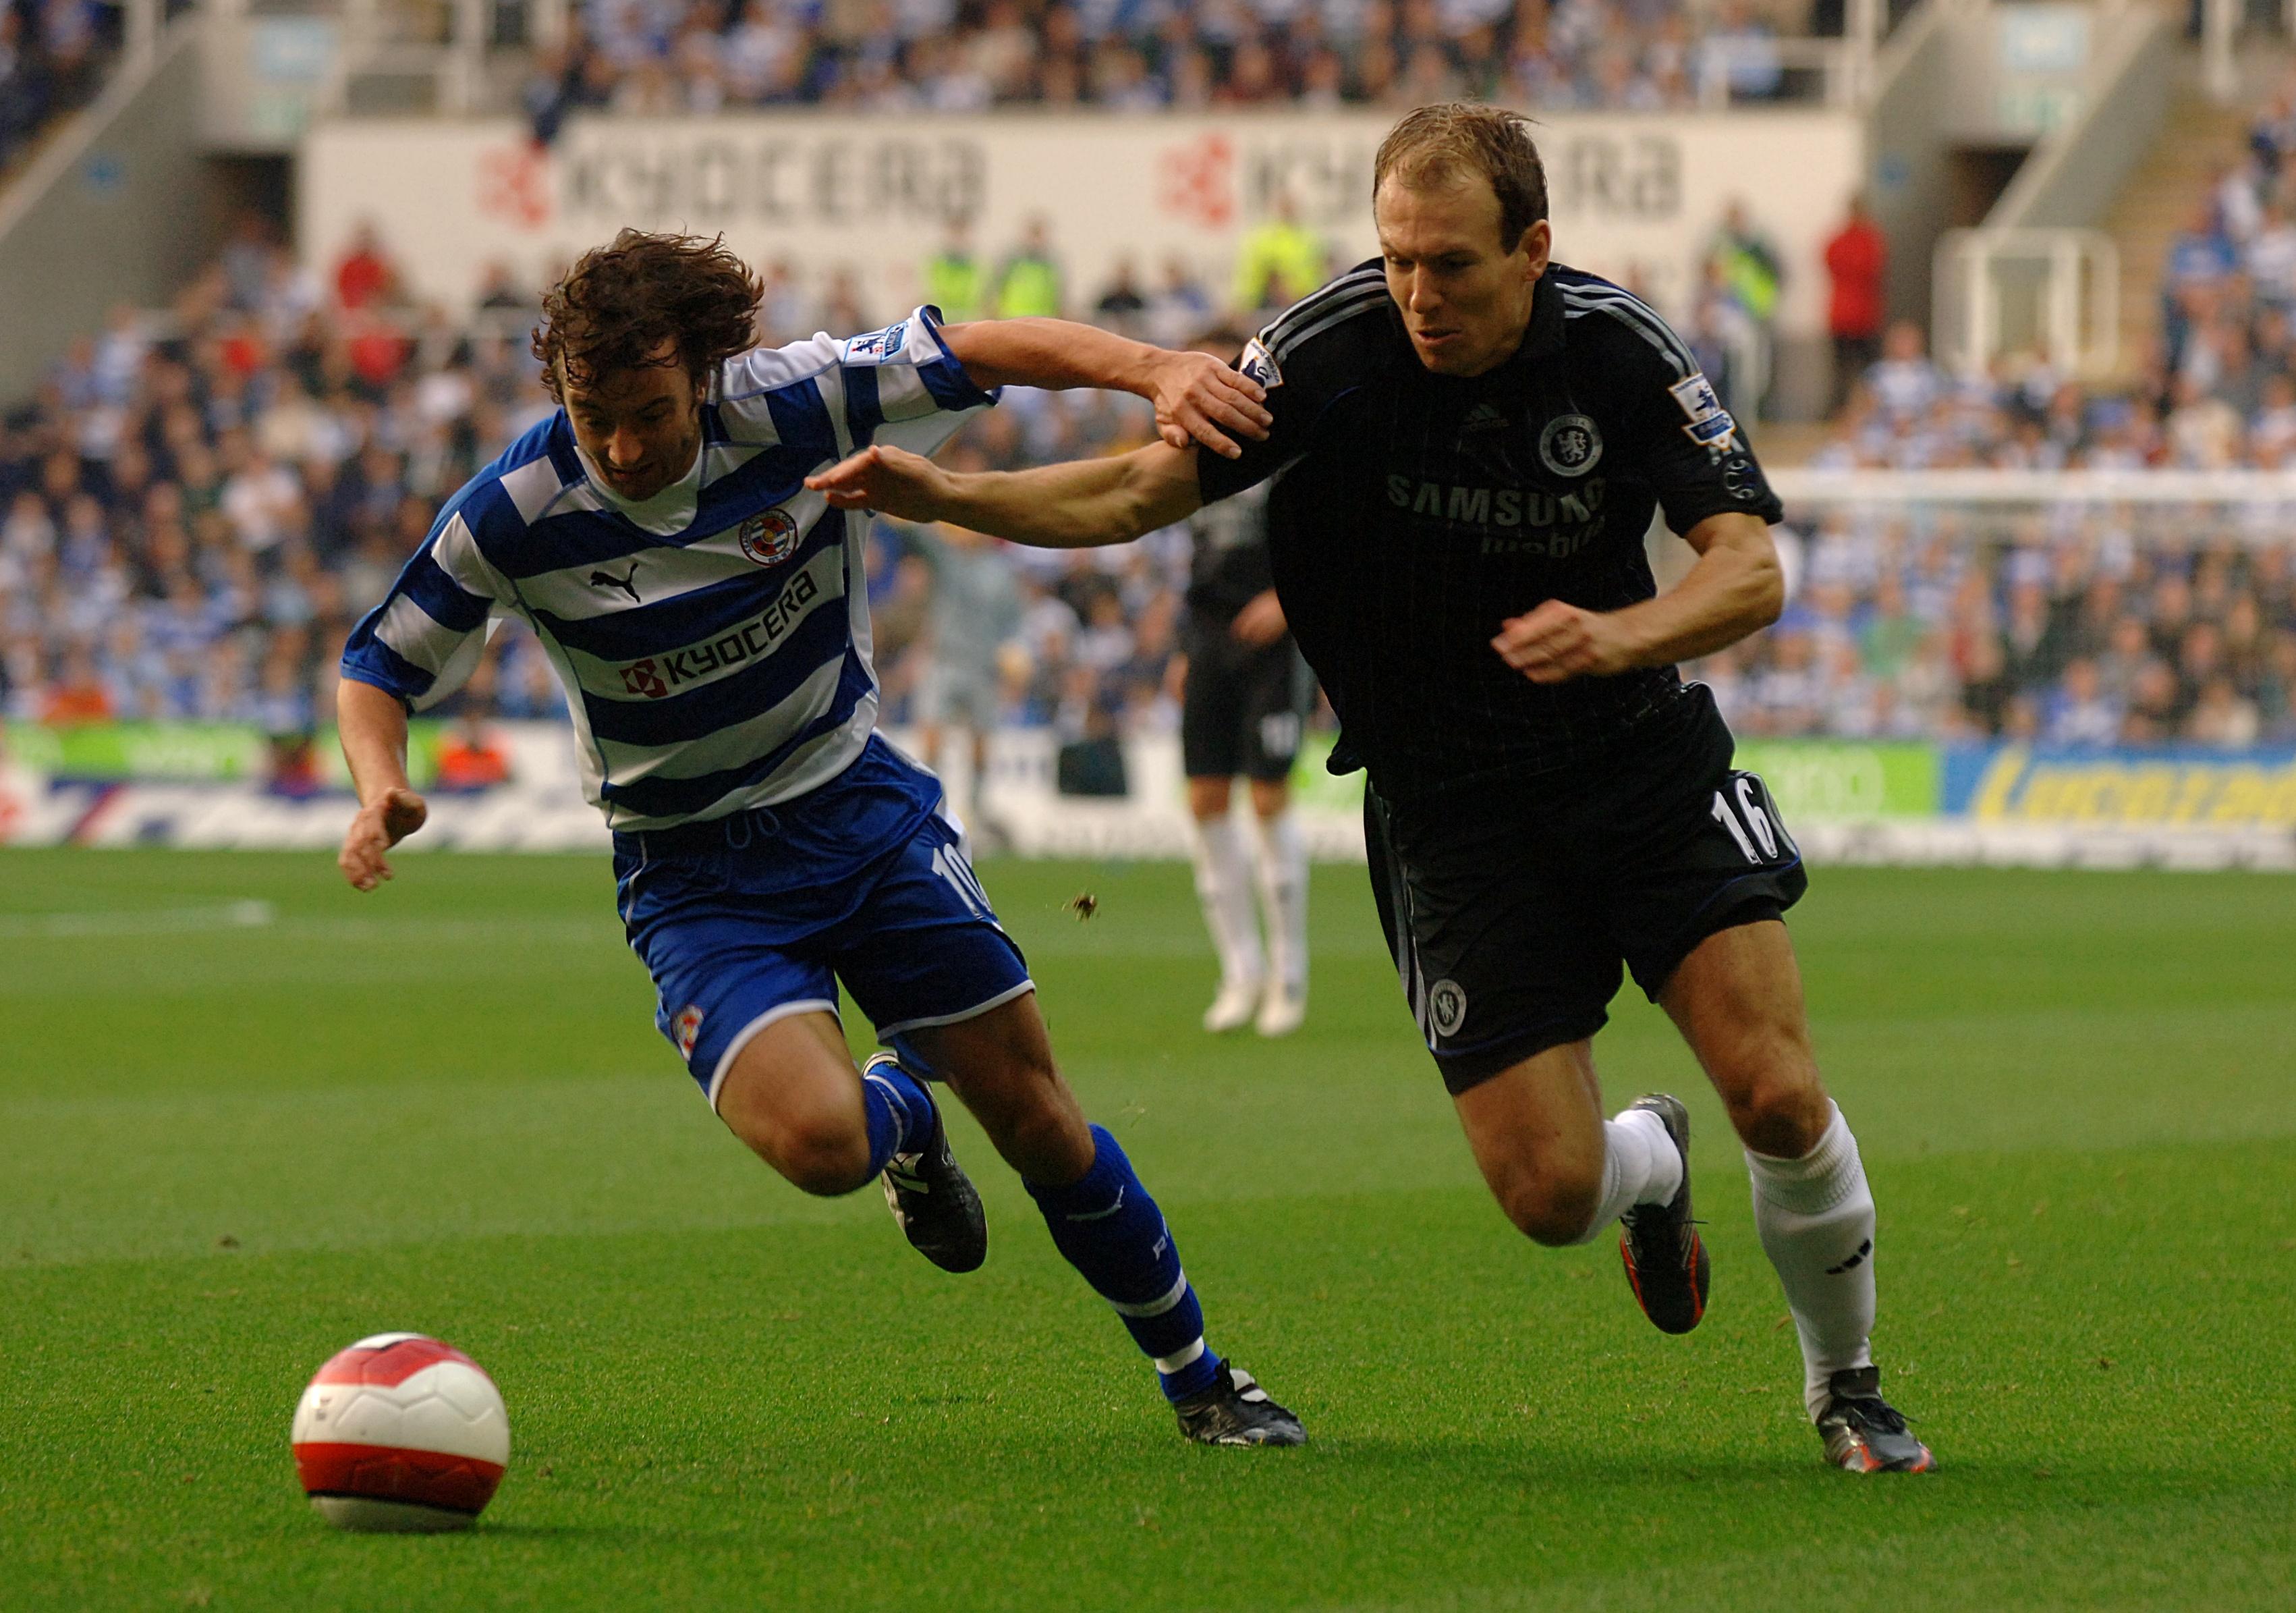 Soccer - FA Barclays Premiership - Reading v Chelsea - Madejski Stadium